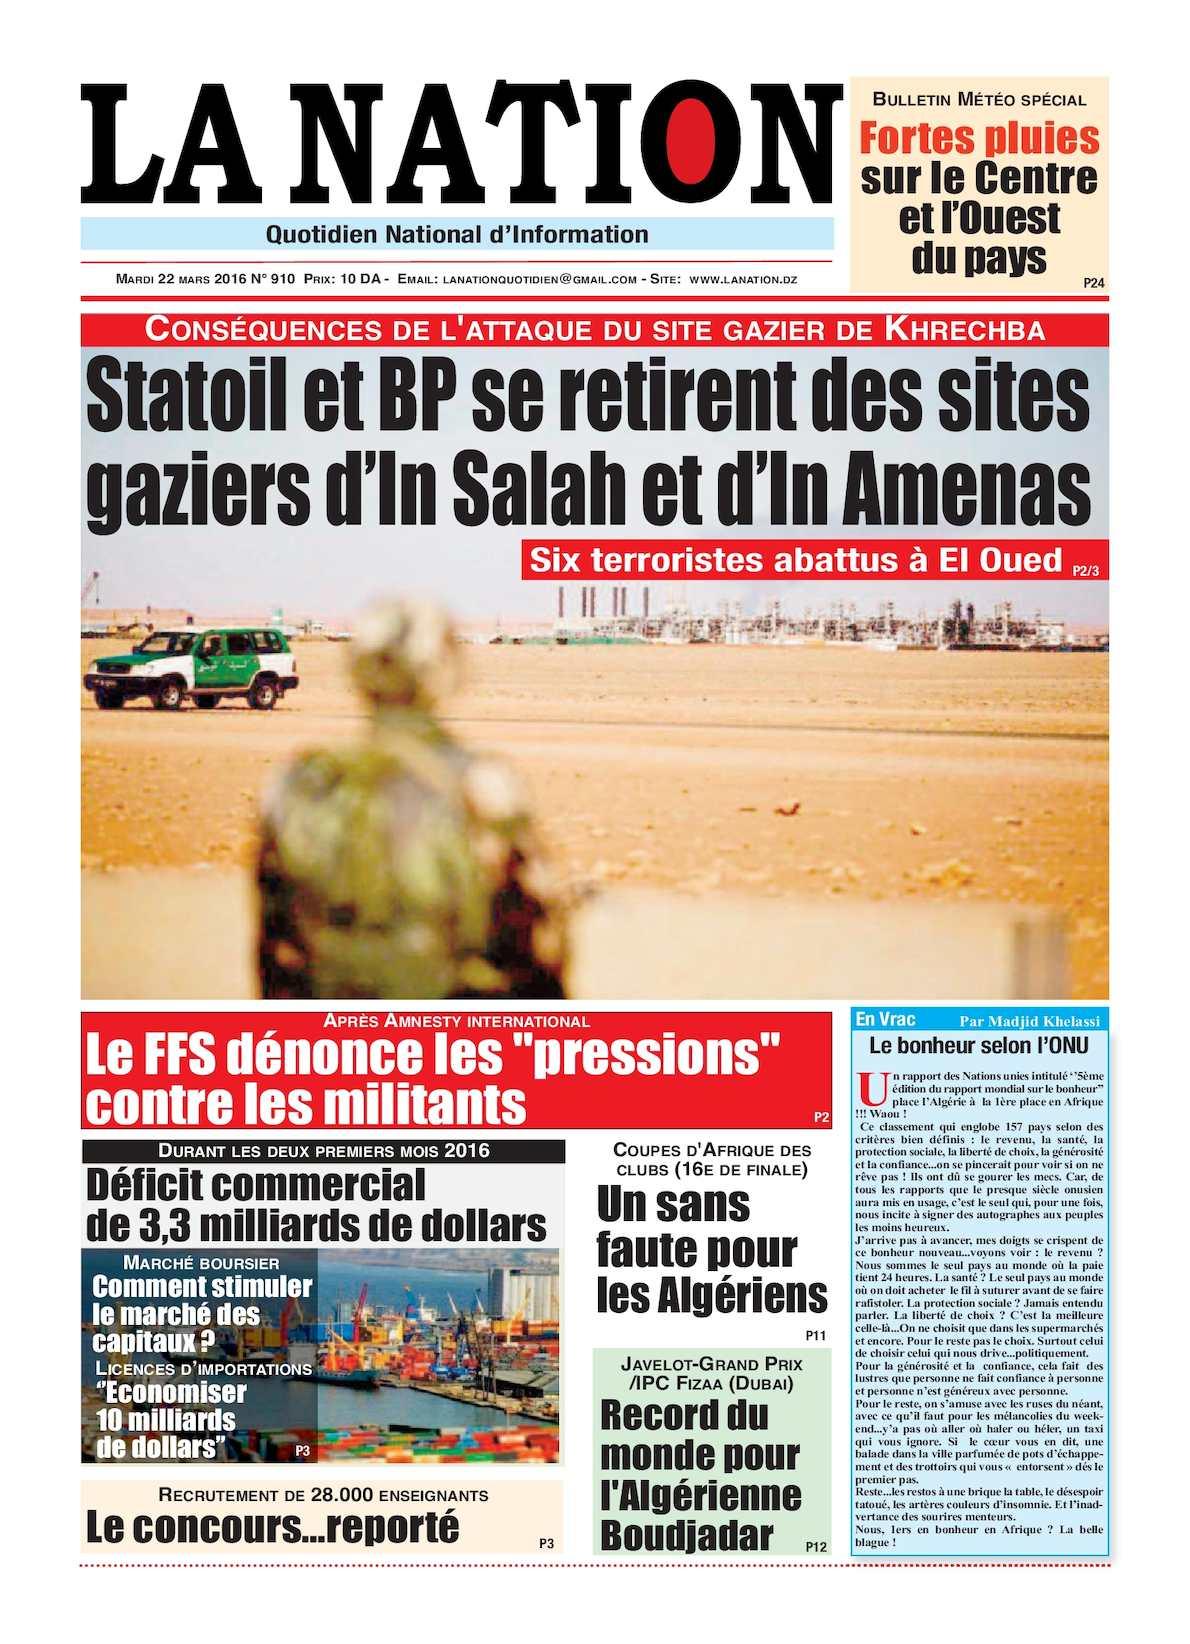 La Nation Edition N 910